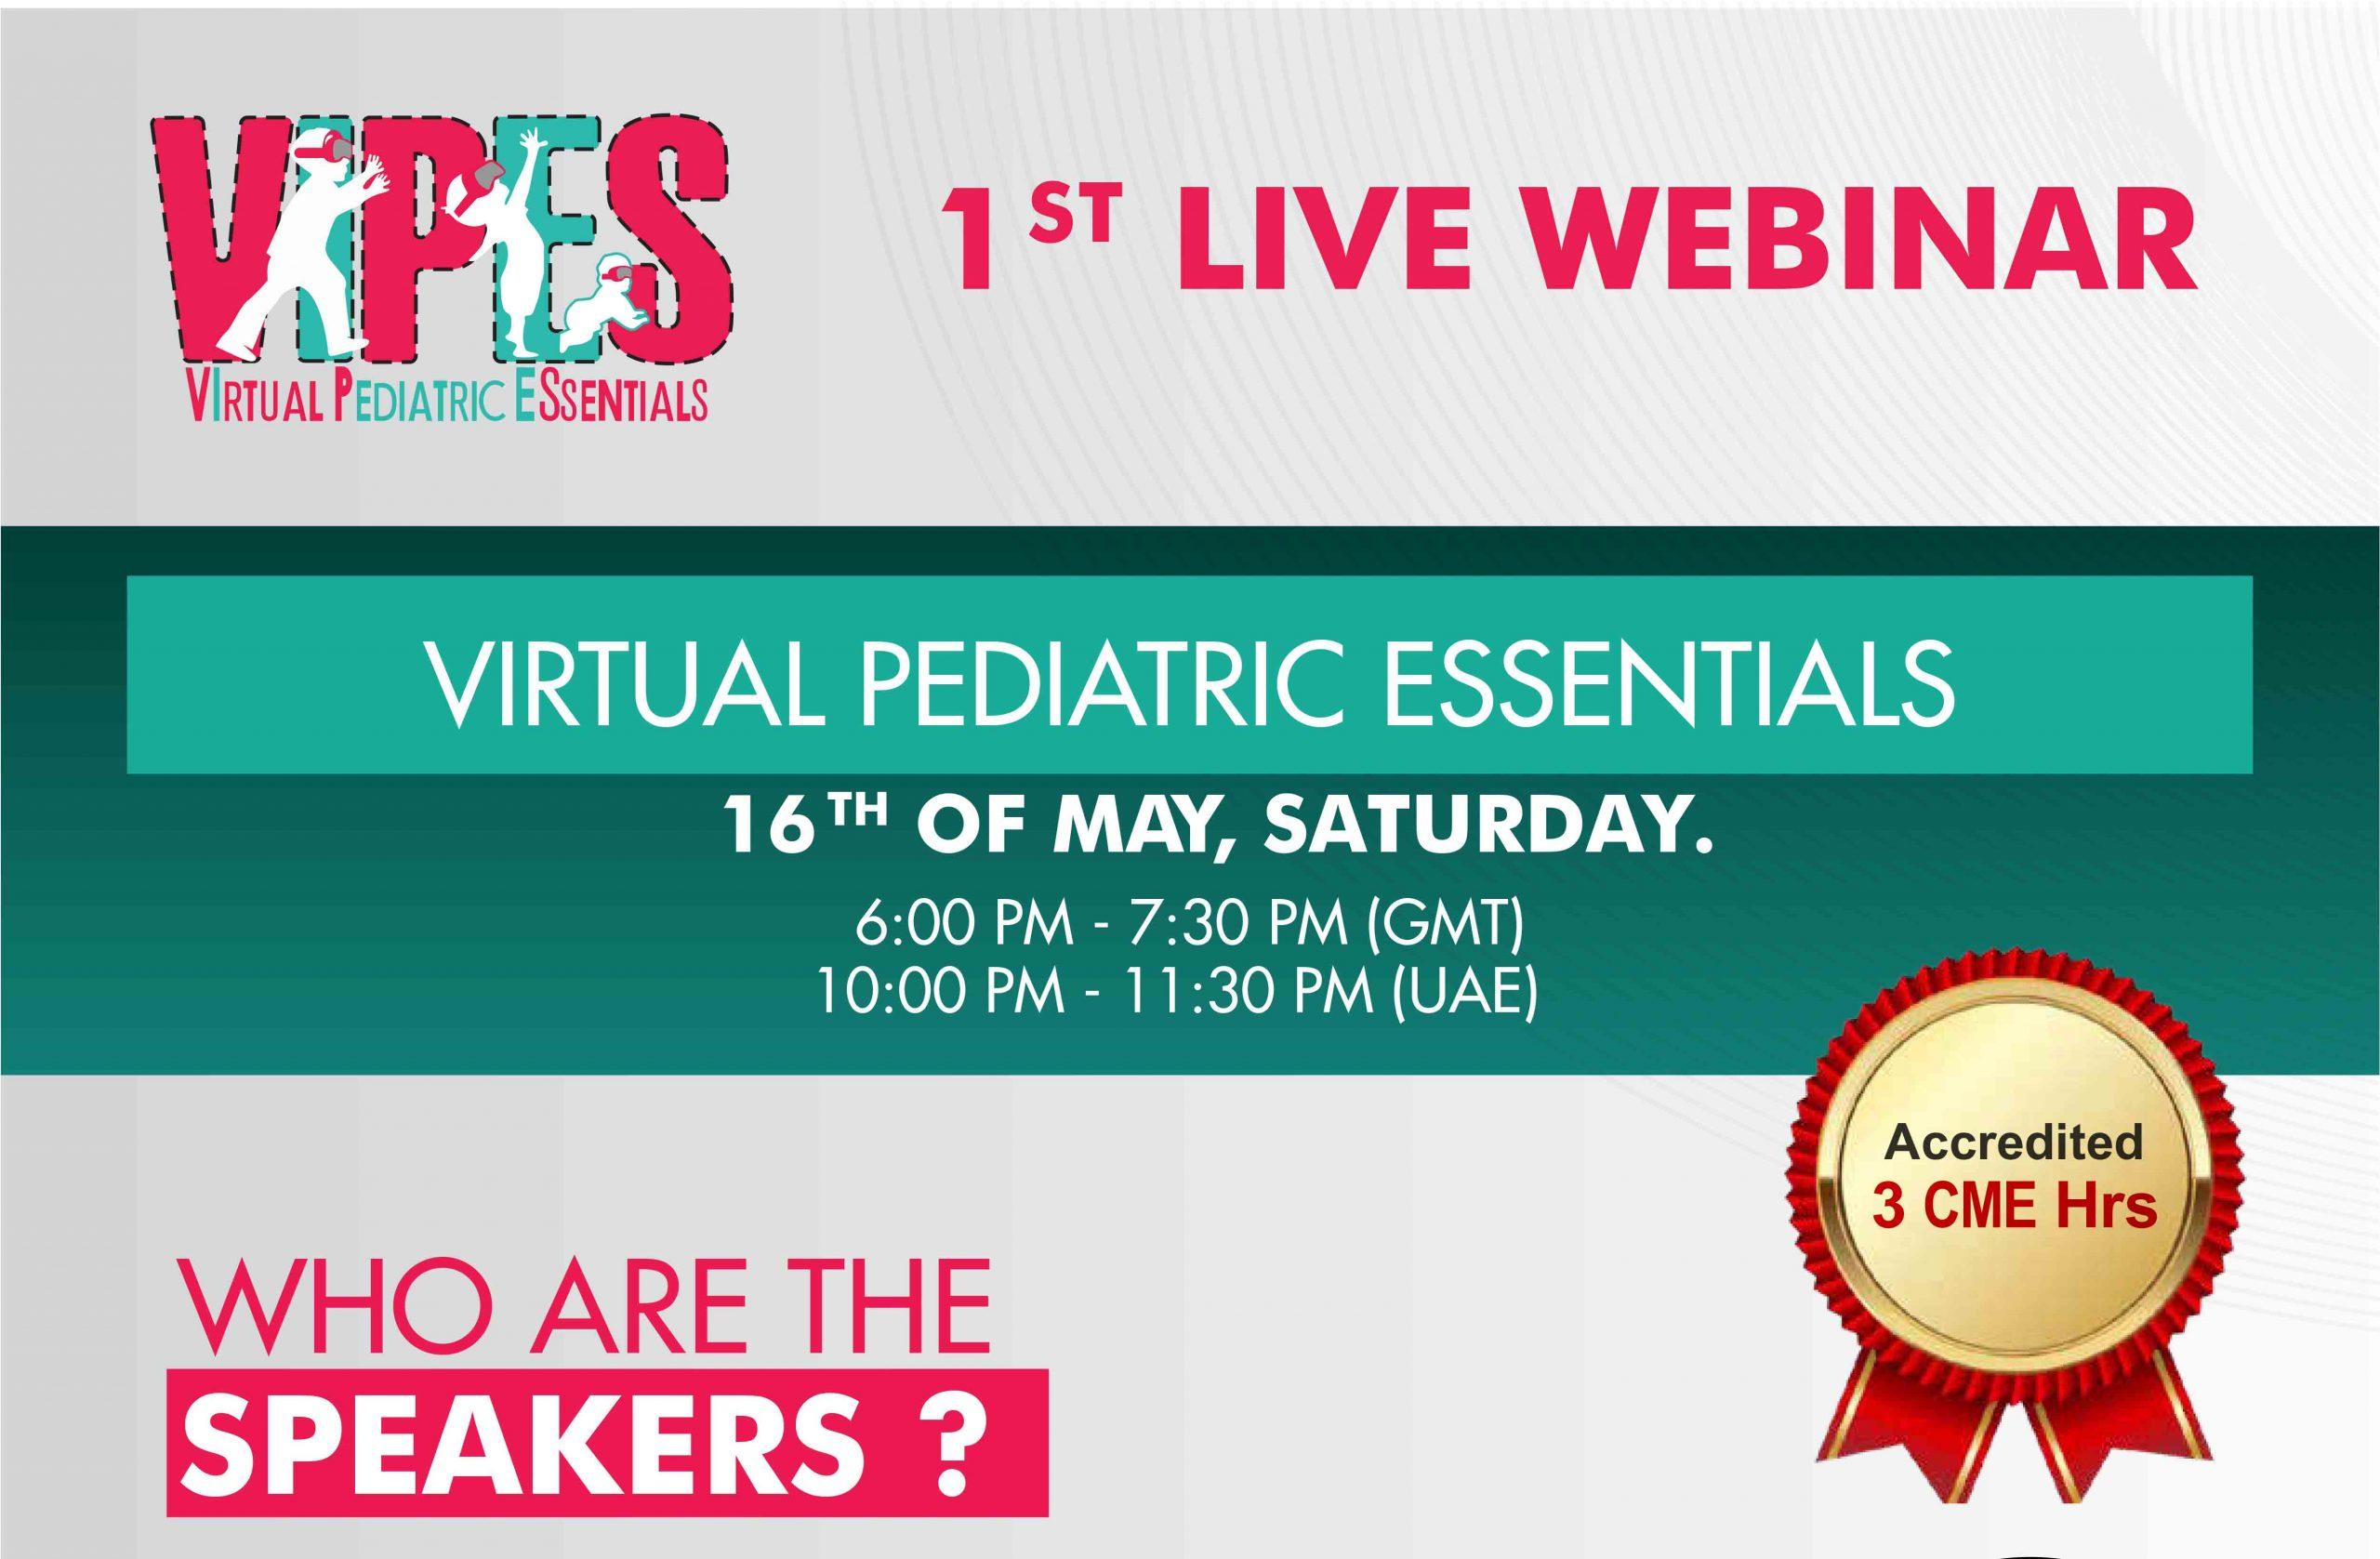 VIPES 1st Live Webinar